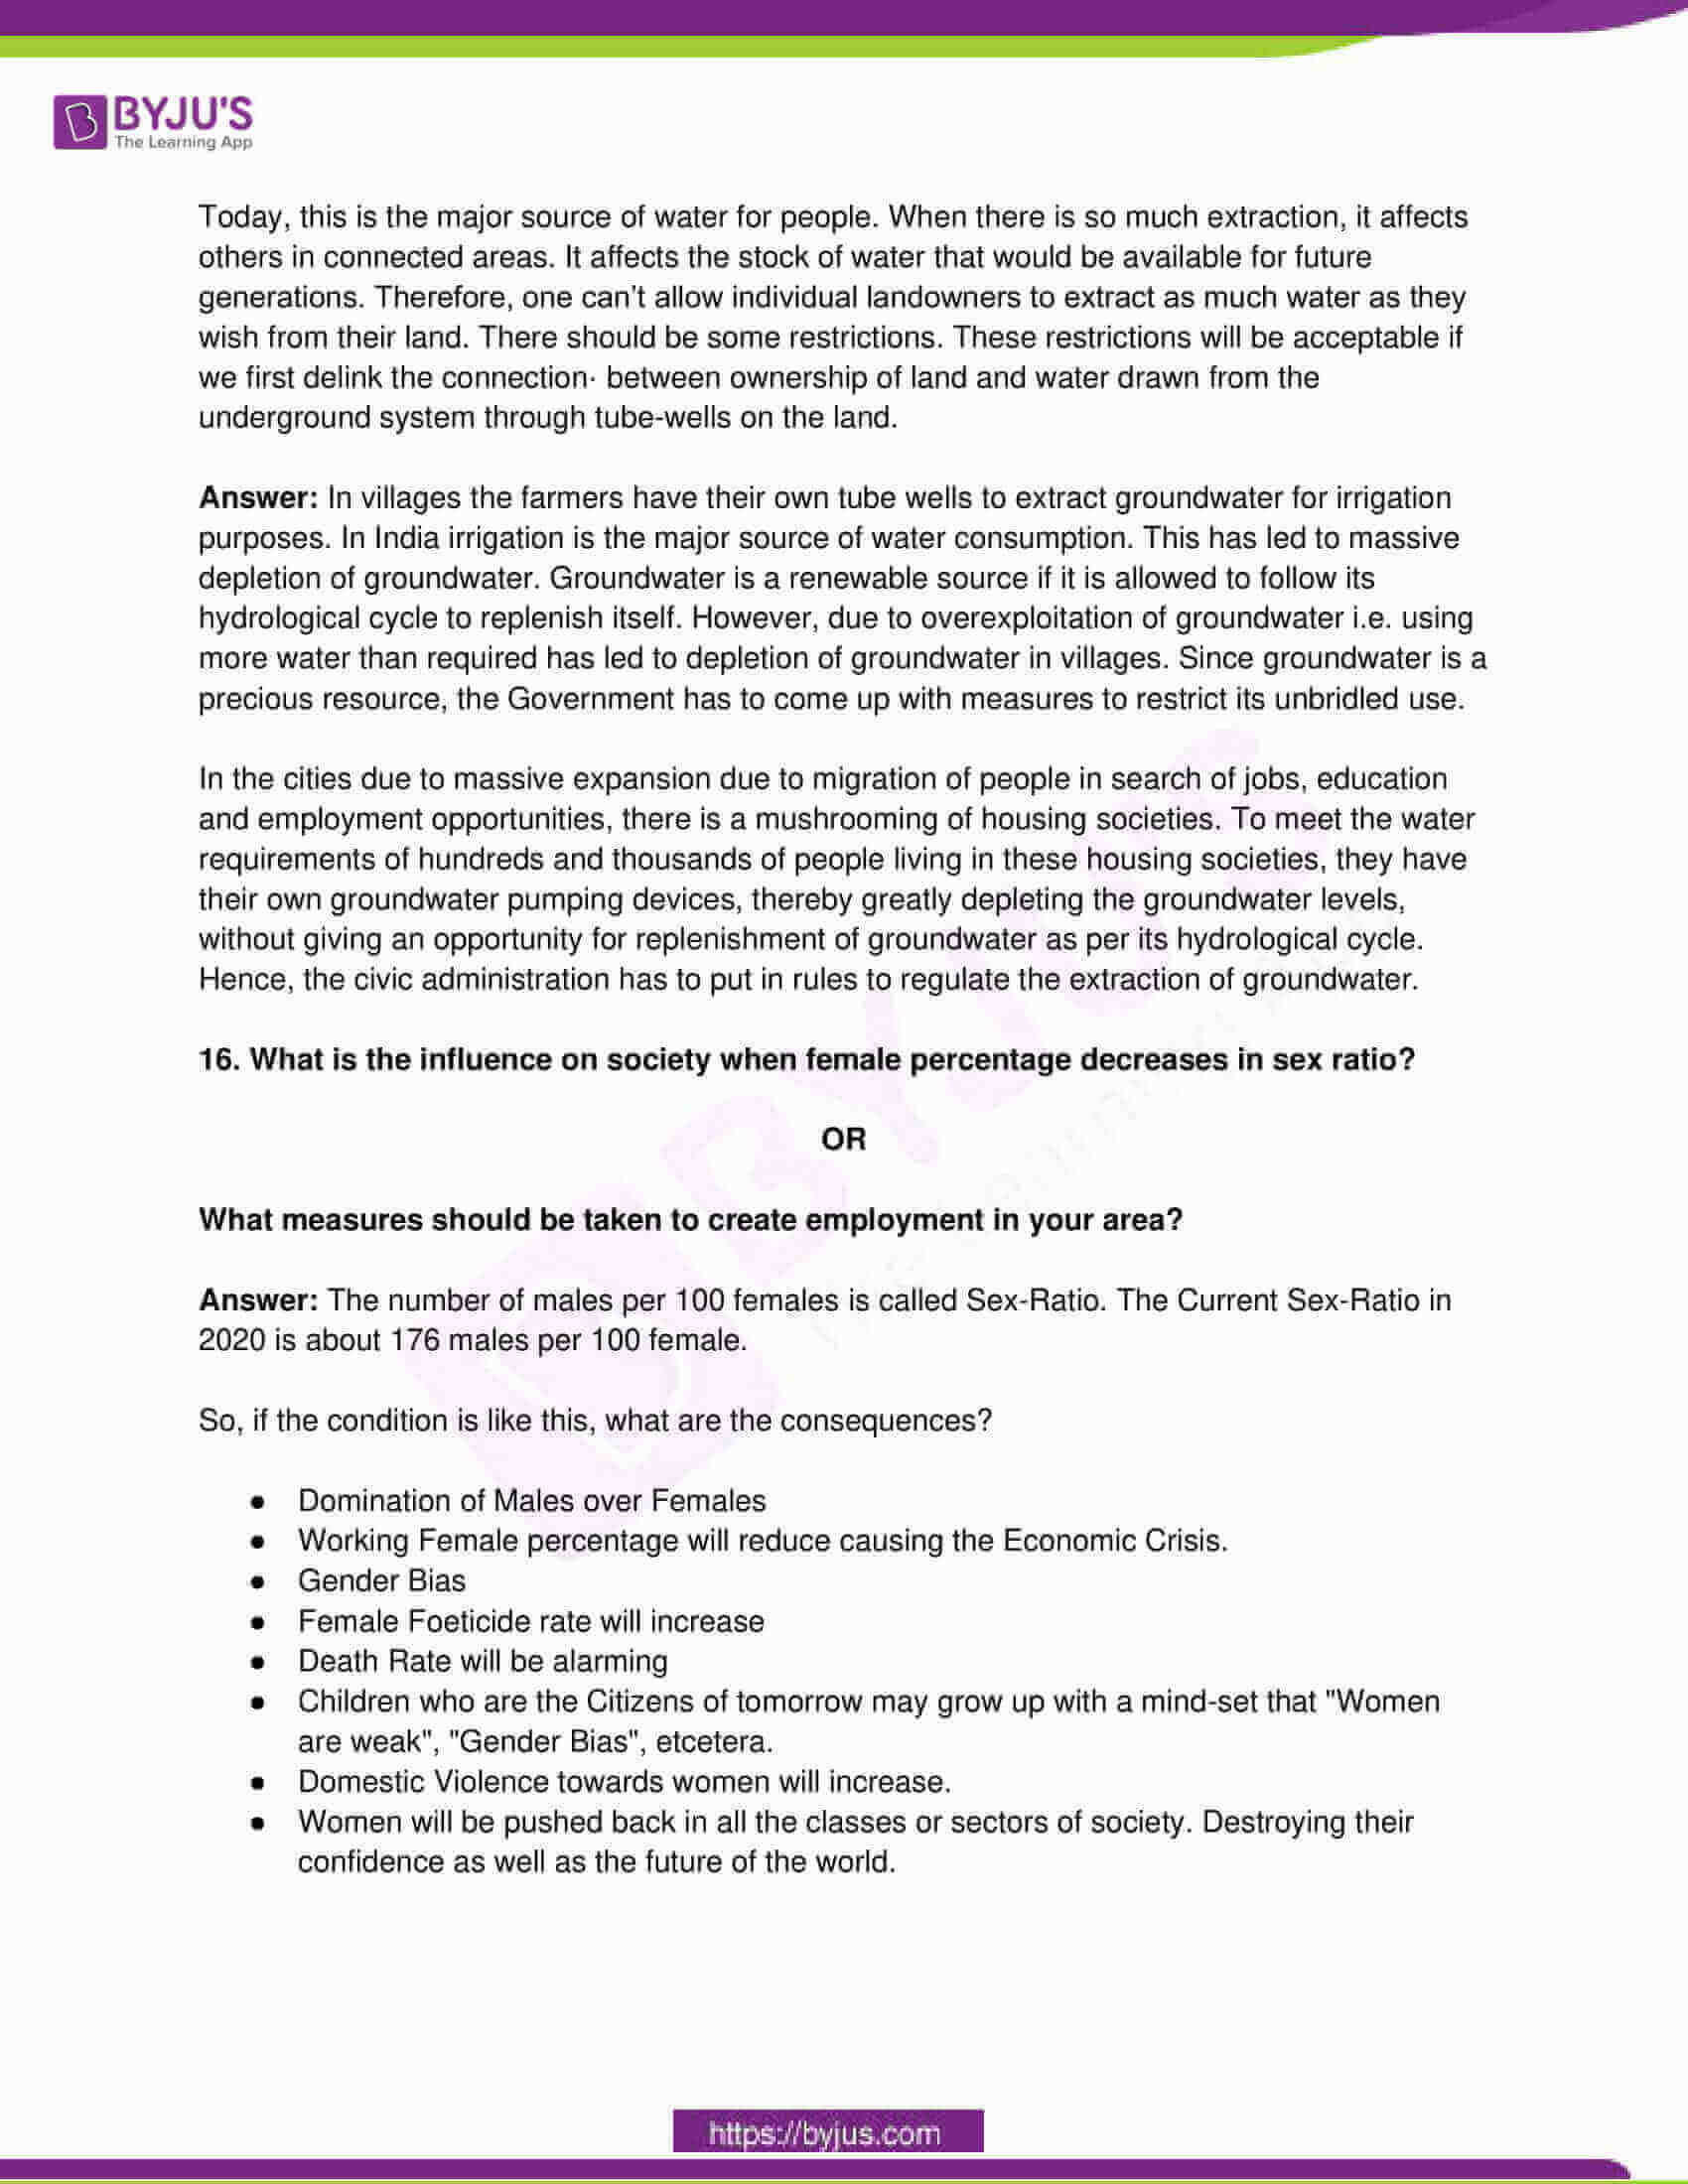 telangana board class 10 social science 2016 paper 1 solutions 6